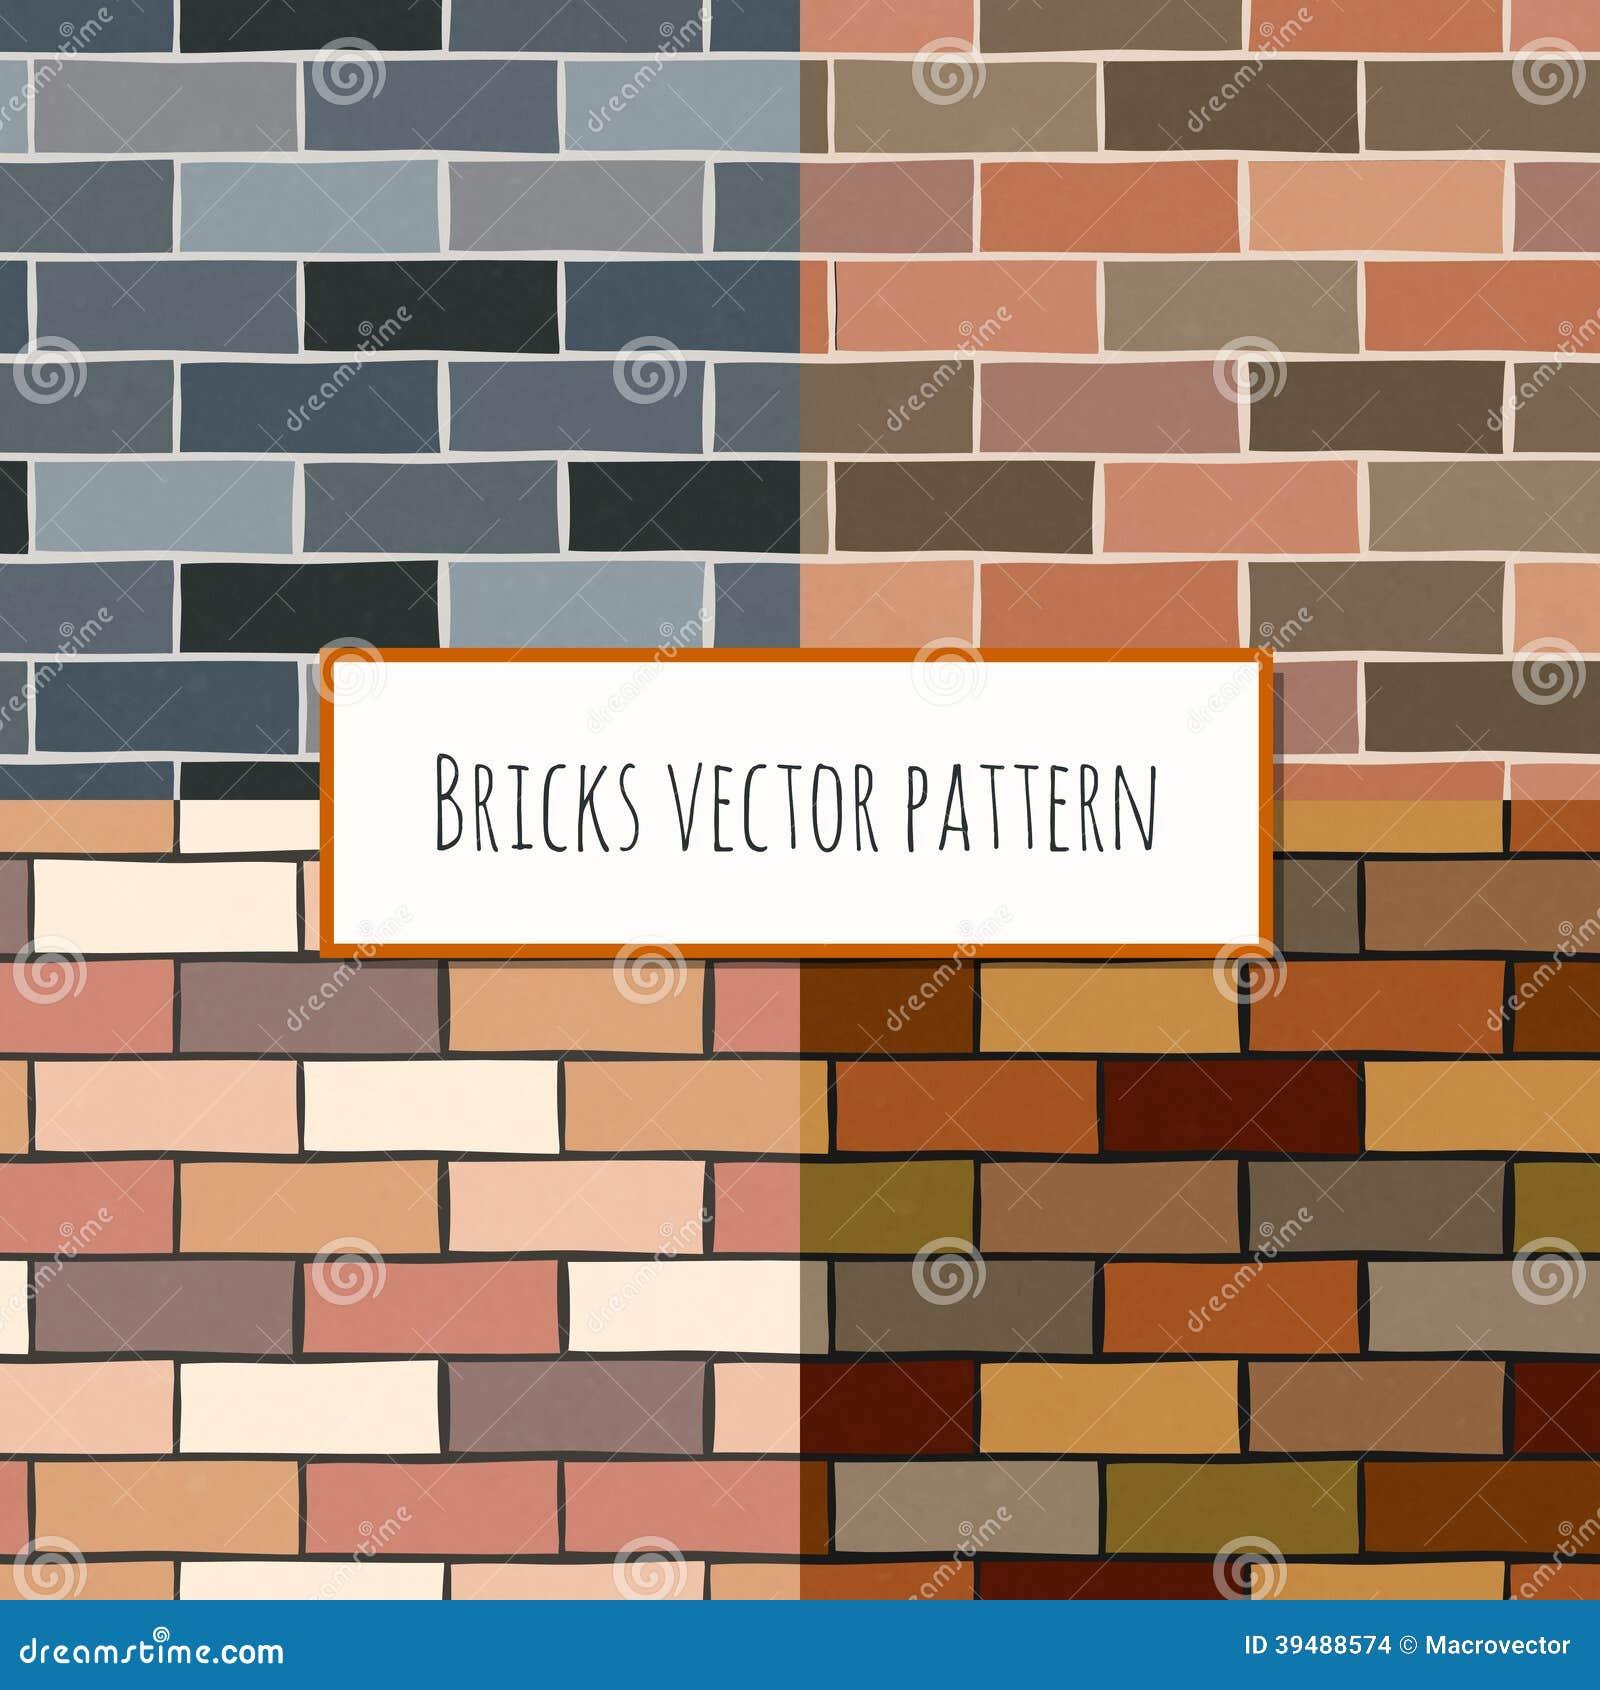 Blocks Texture Vector Cartoon Vector